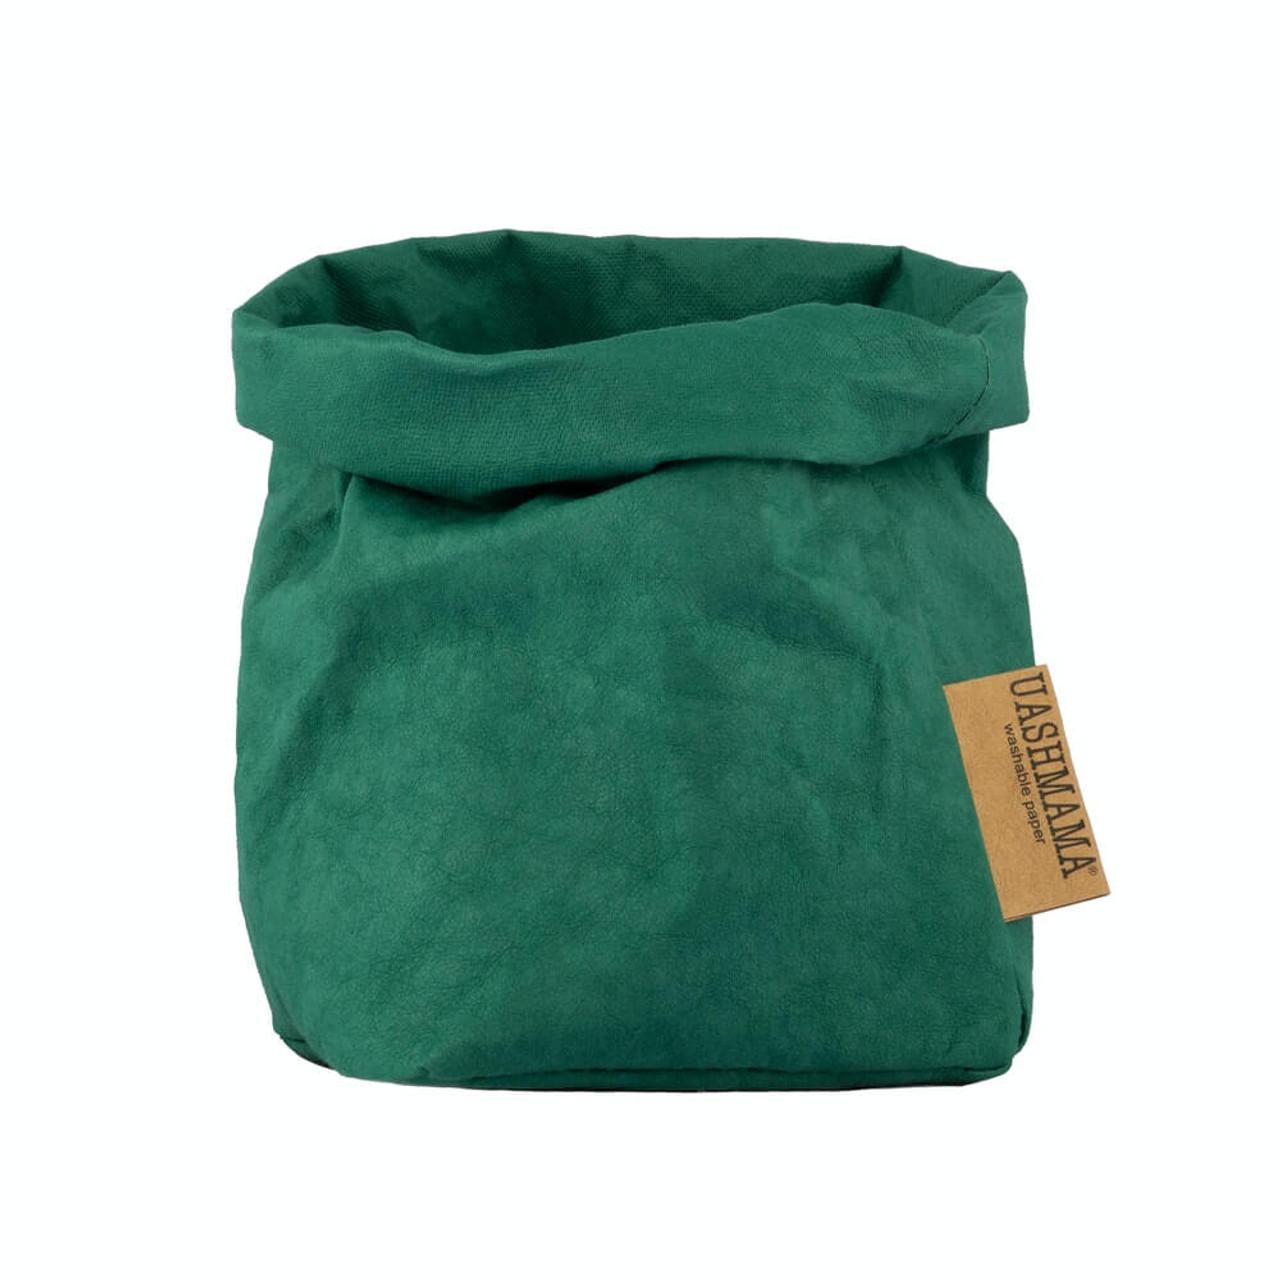 UASHMAMA small organic paper bags smeraldo